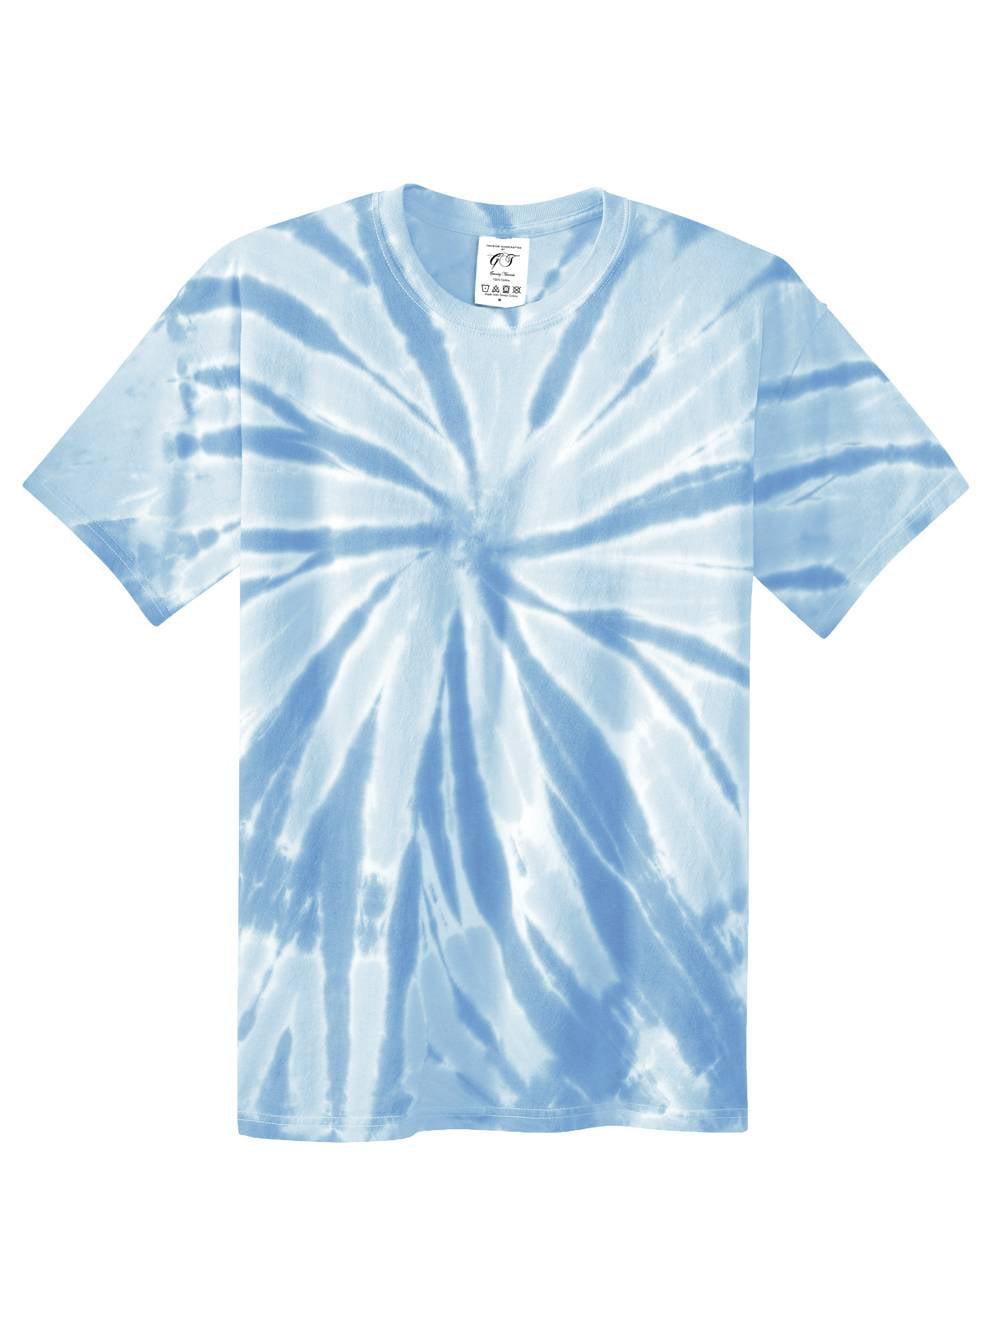 JESUS Mens L Tee Shirt Gildan Gray WalMart Isn/'t The Only saving Place Church